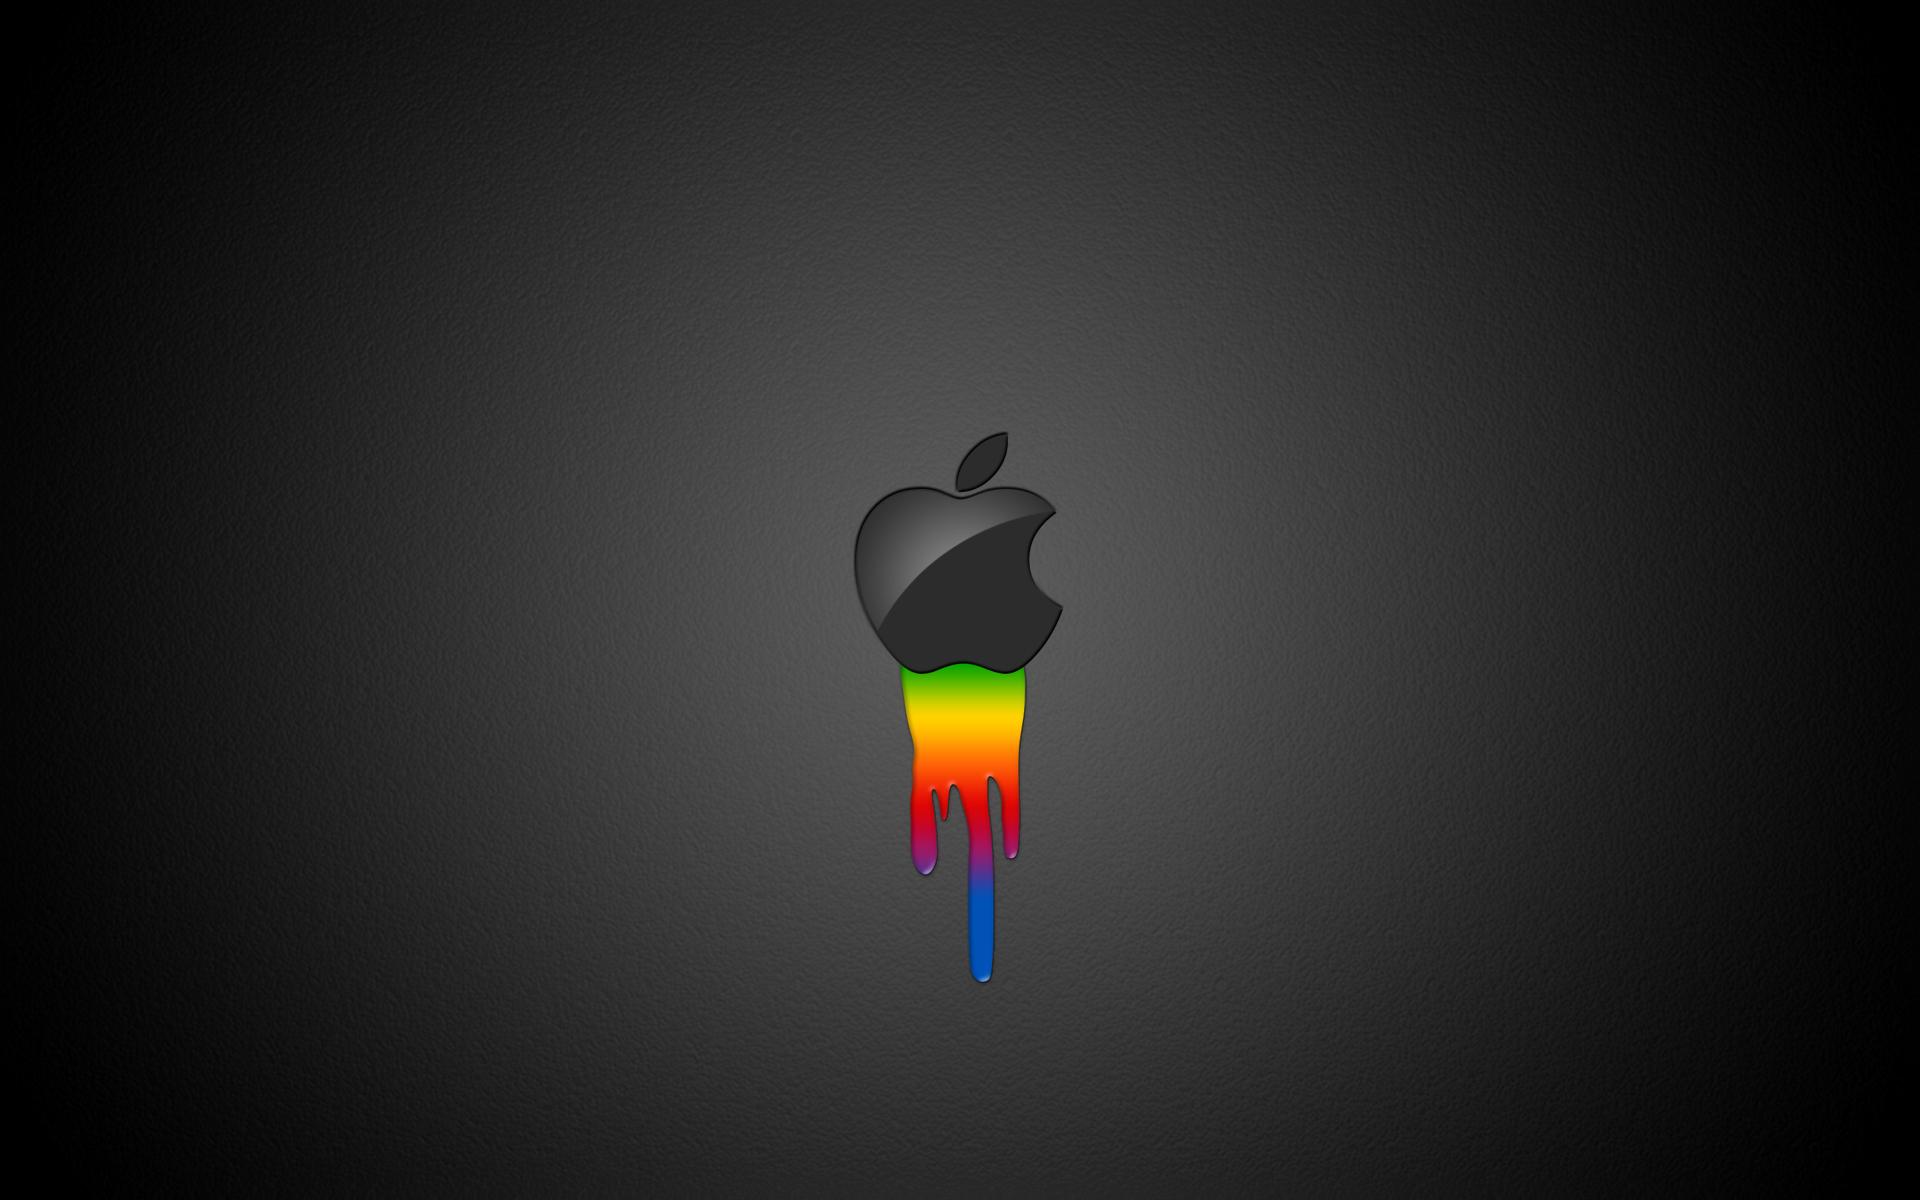 Mac Wallpapers | Best Wallpapers